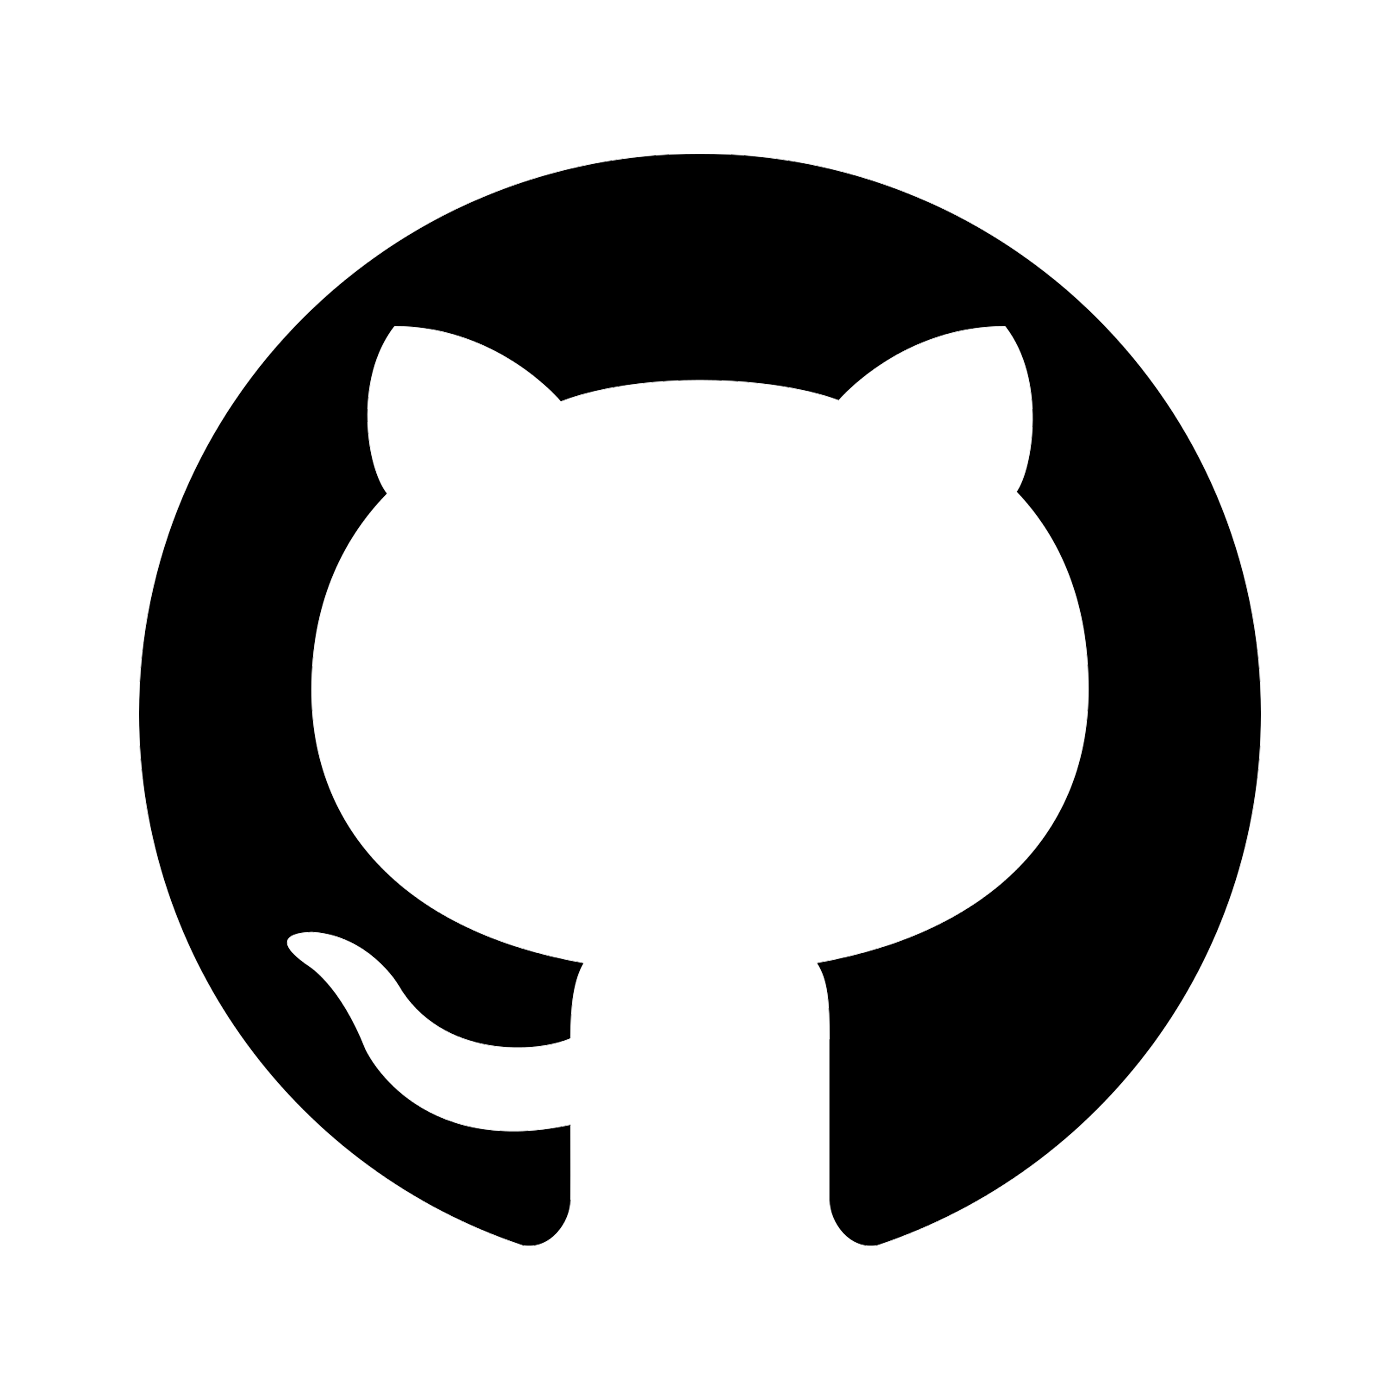 The GitHub logo